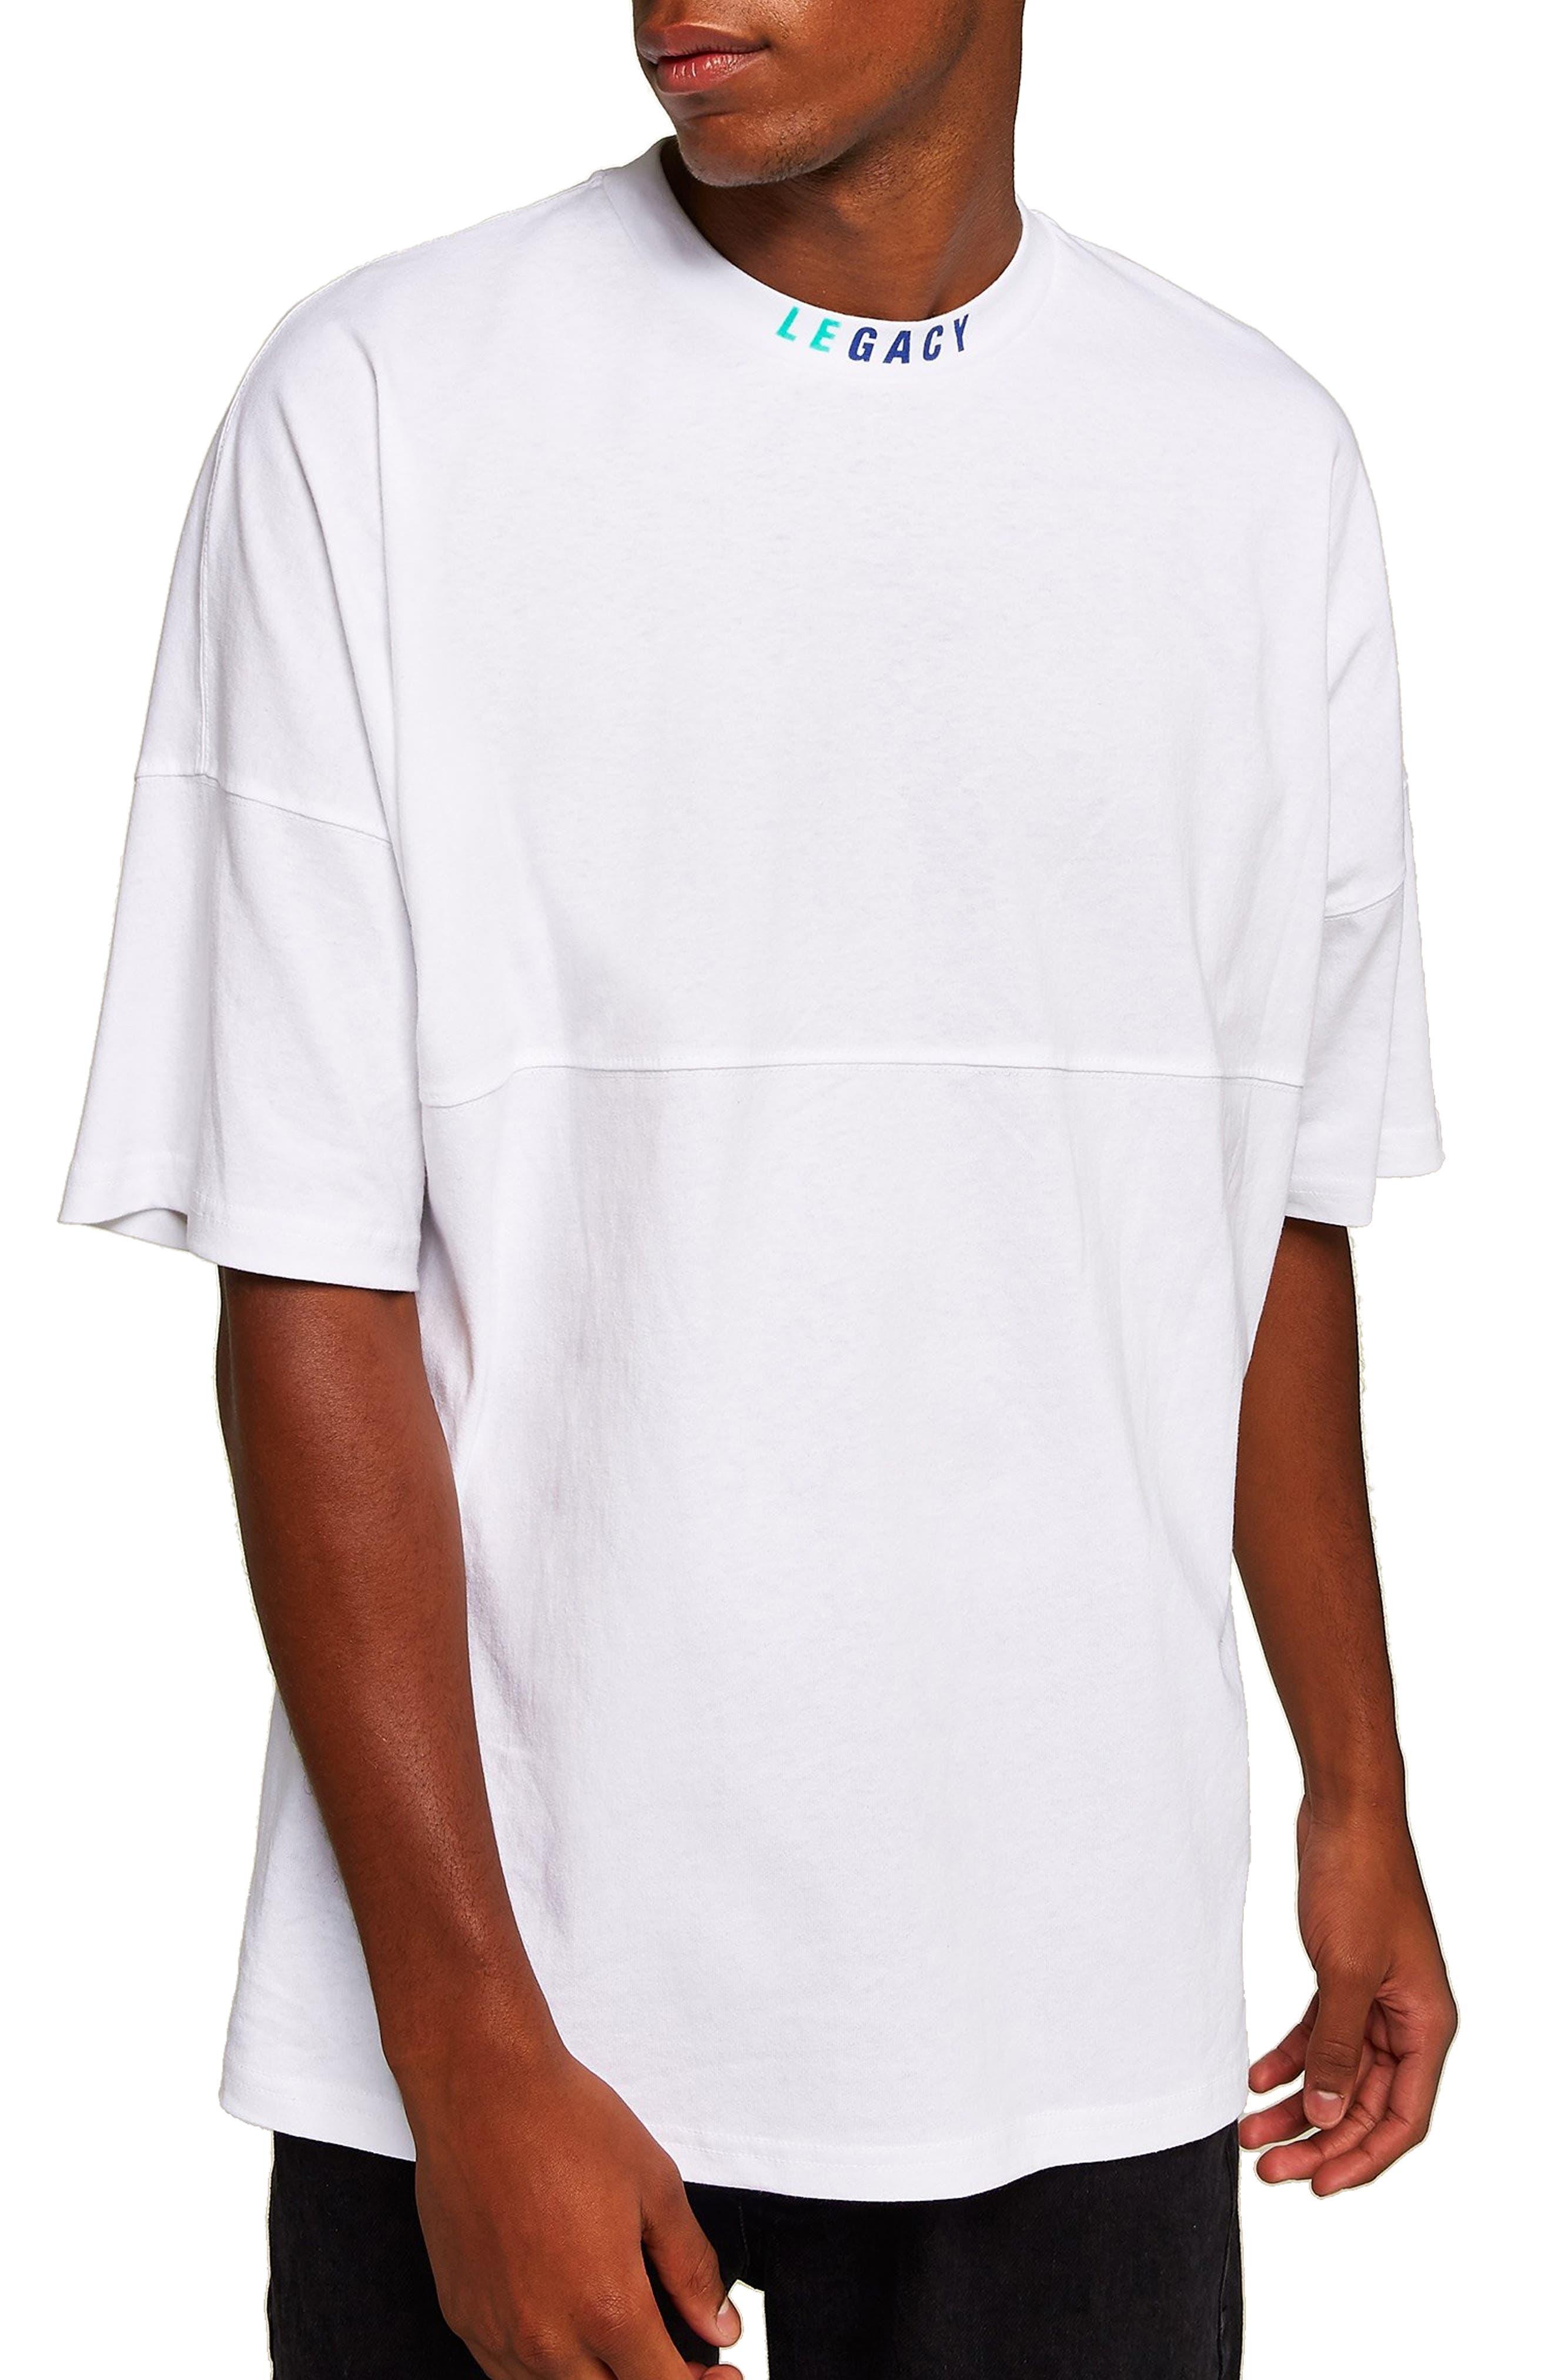 Topman Legacy Oversize T-Shirt, White